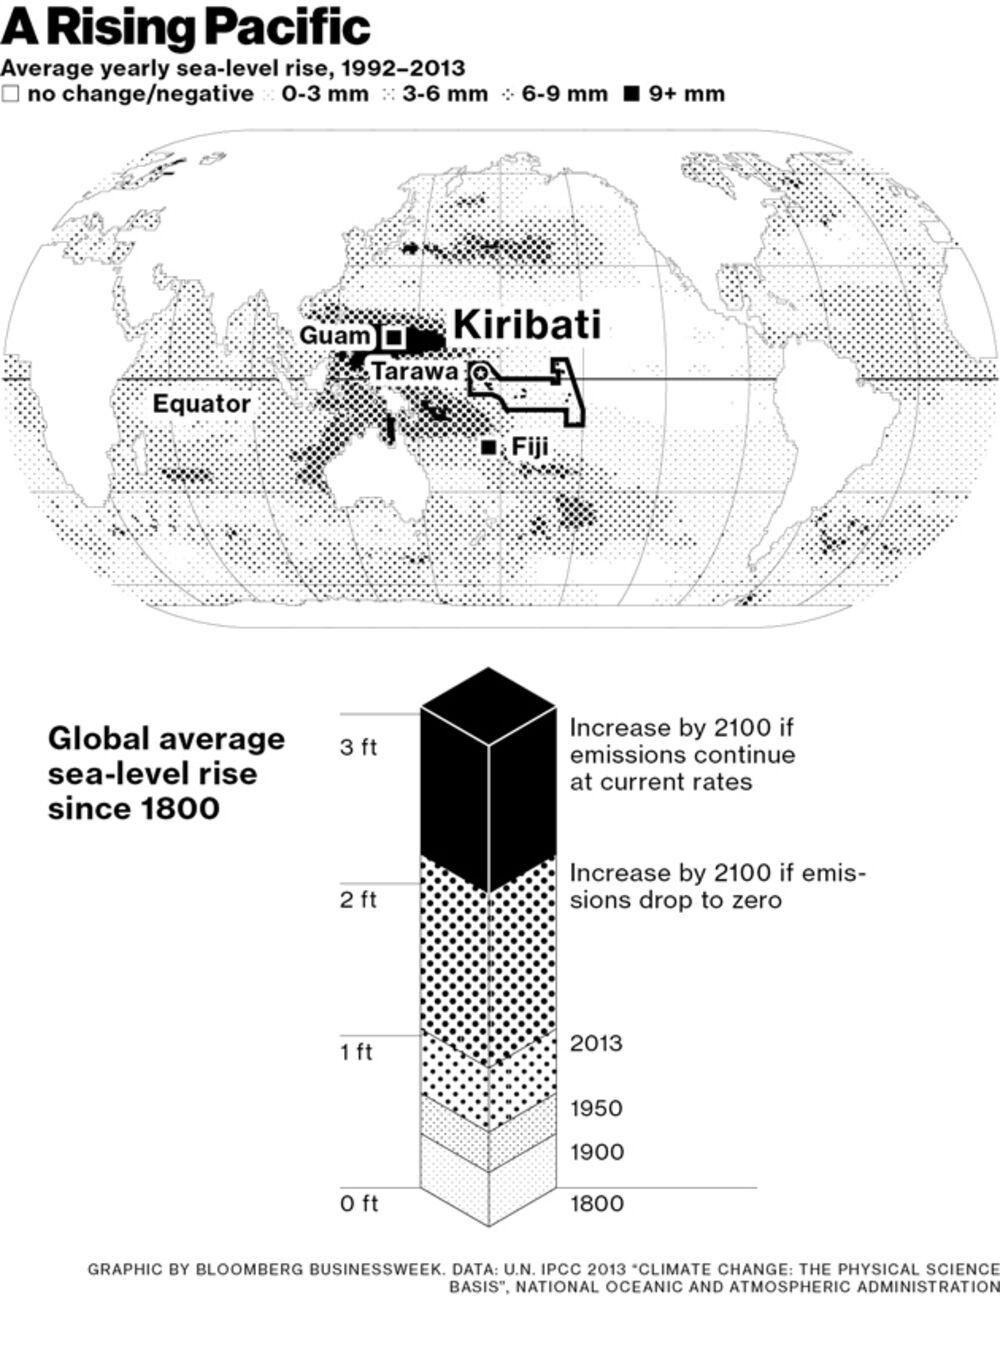 Kiribati: Climate Change Destroys Pacific Island Nation - Bloomberg